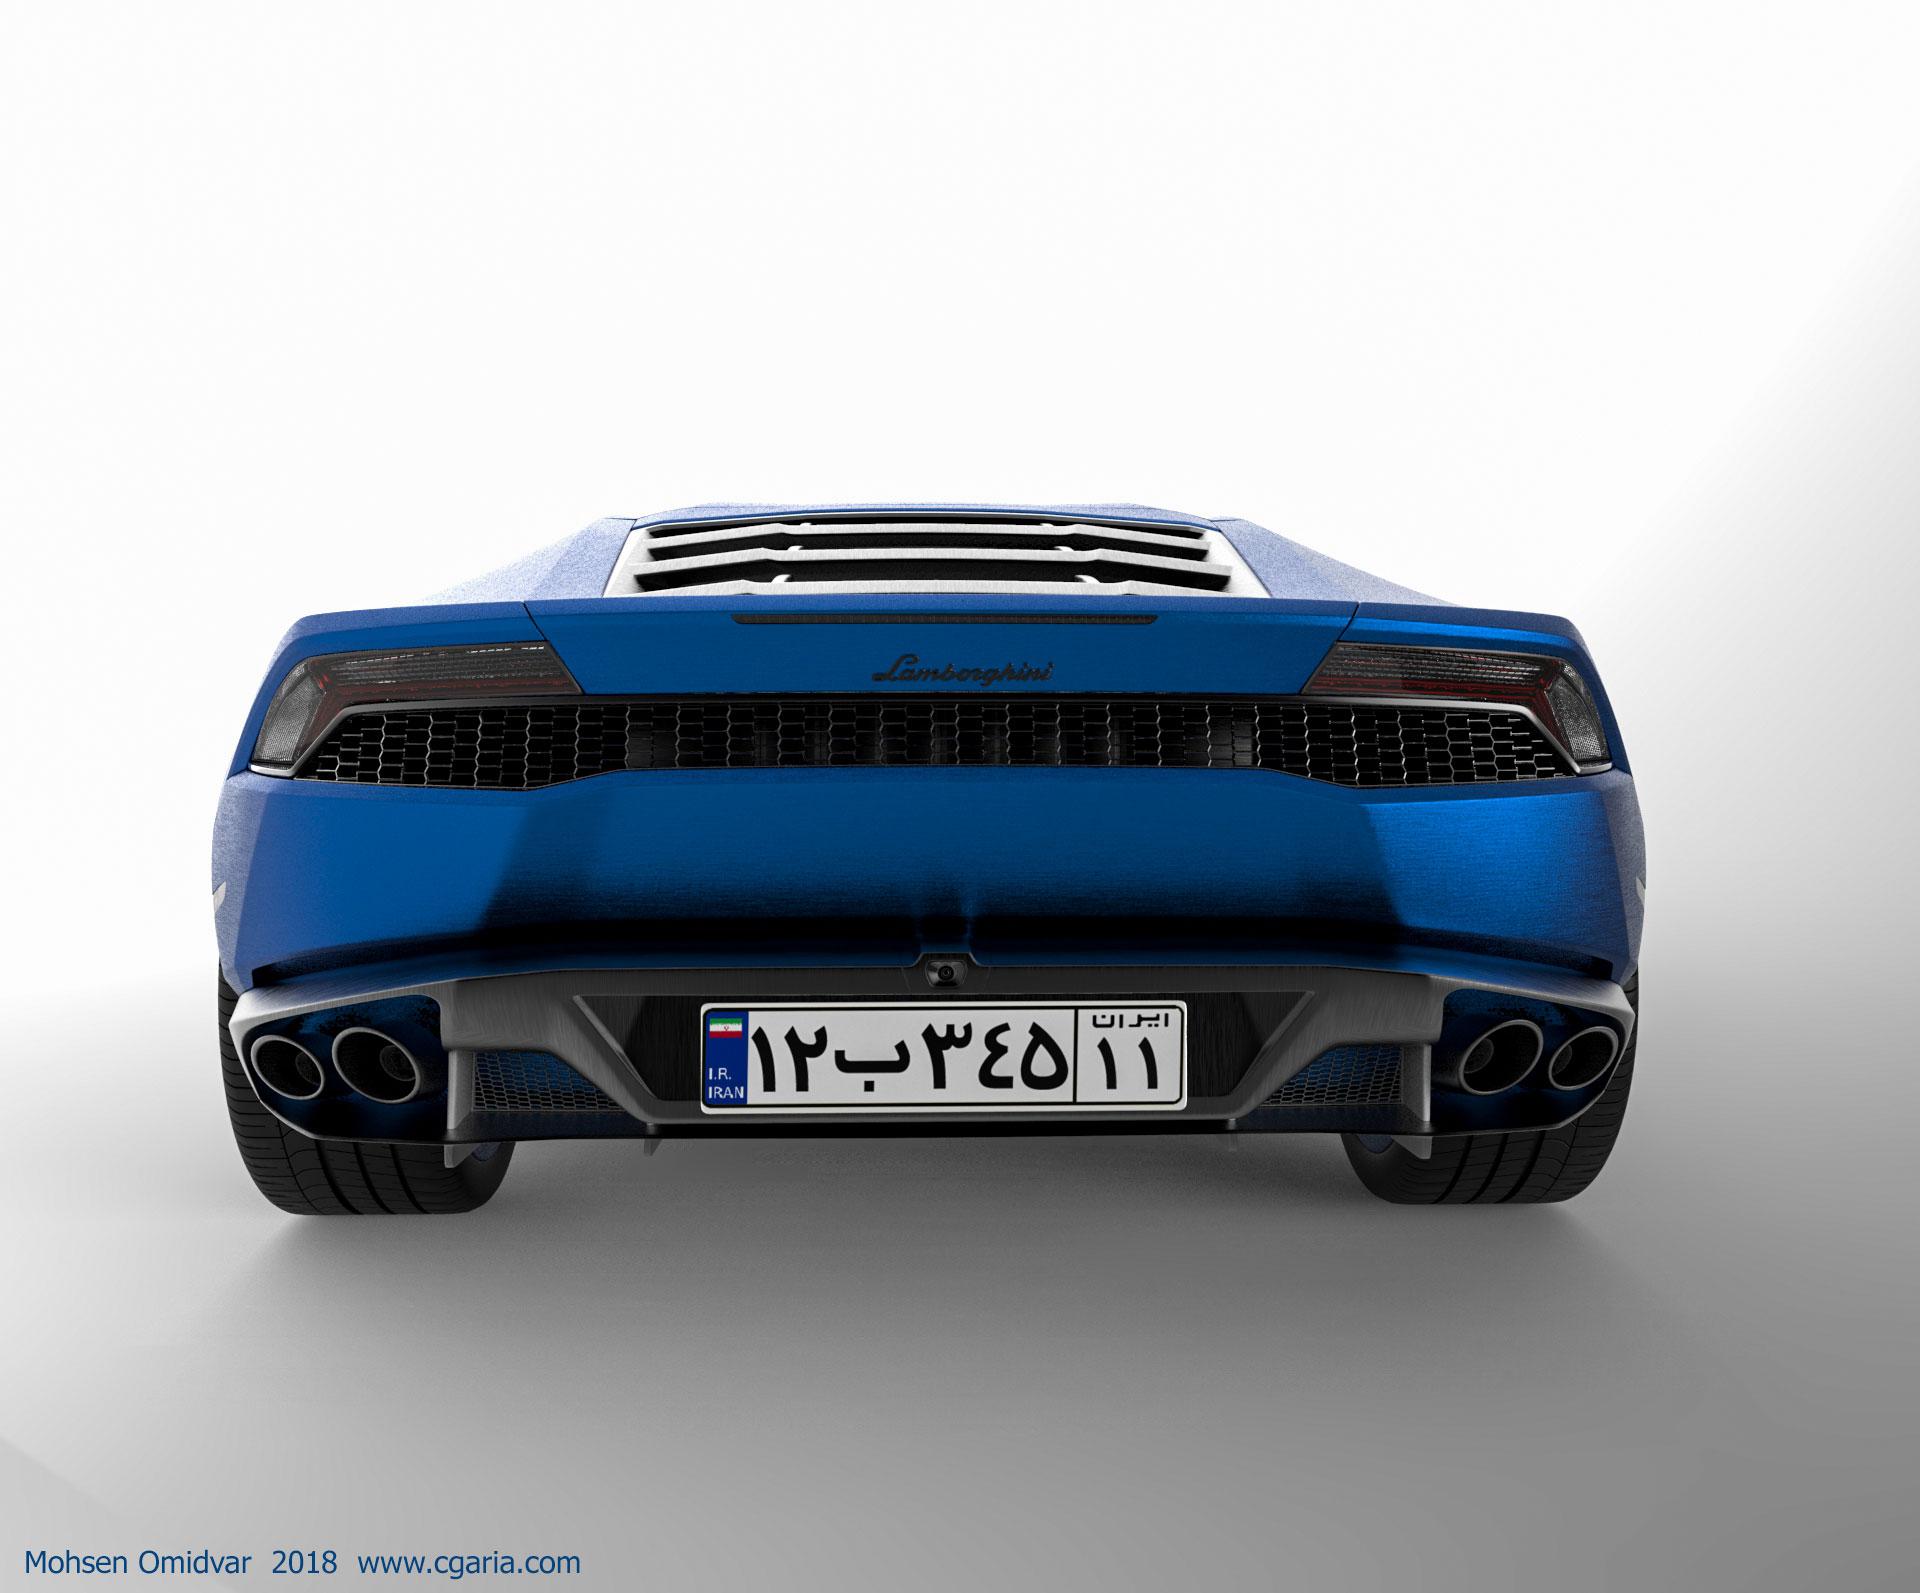 دانلود مدل سه بعدی لامبورگینی هوراکان Lamborghini Huracan